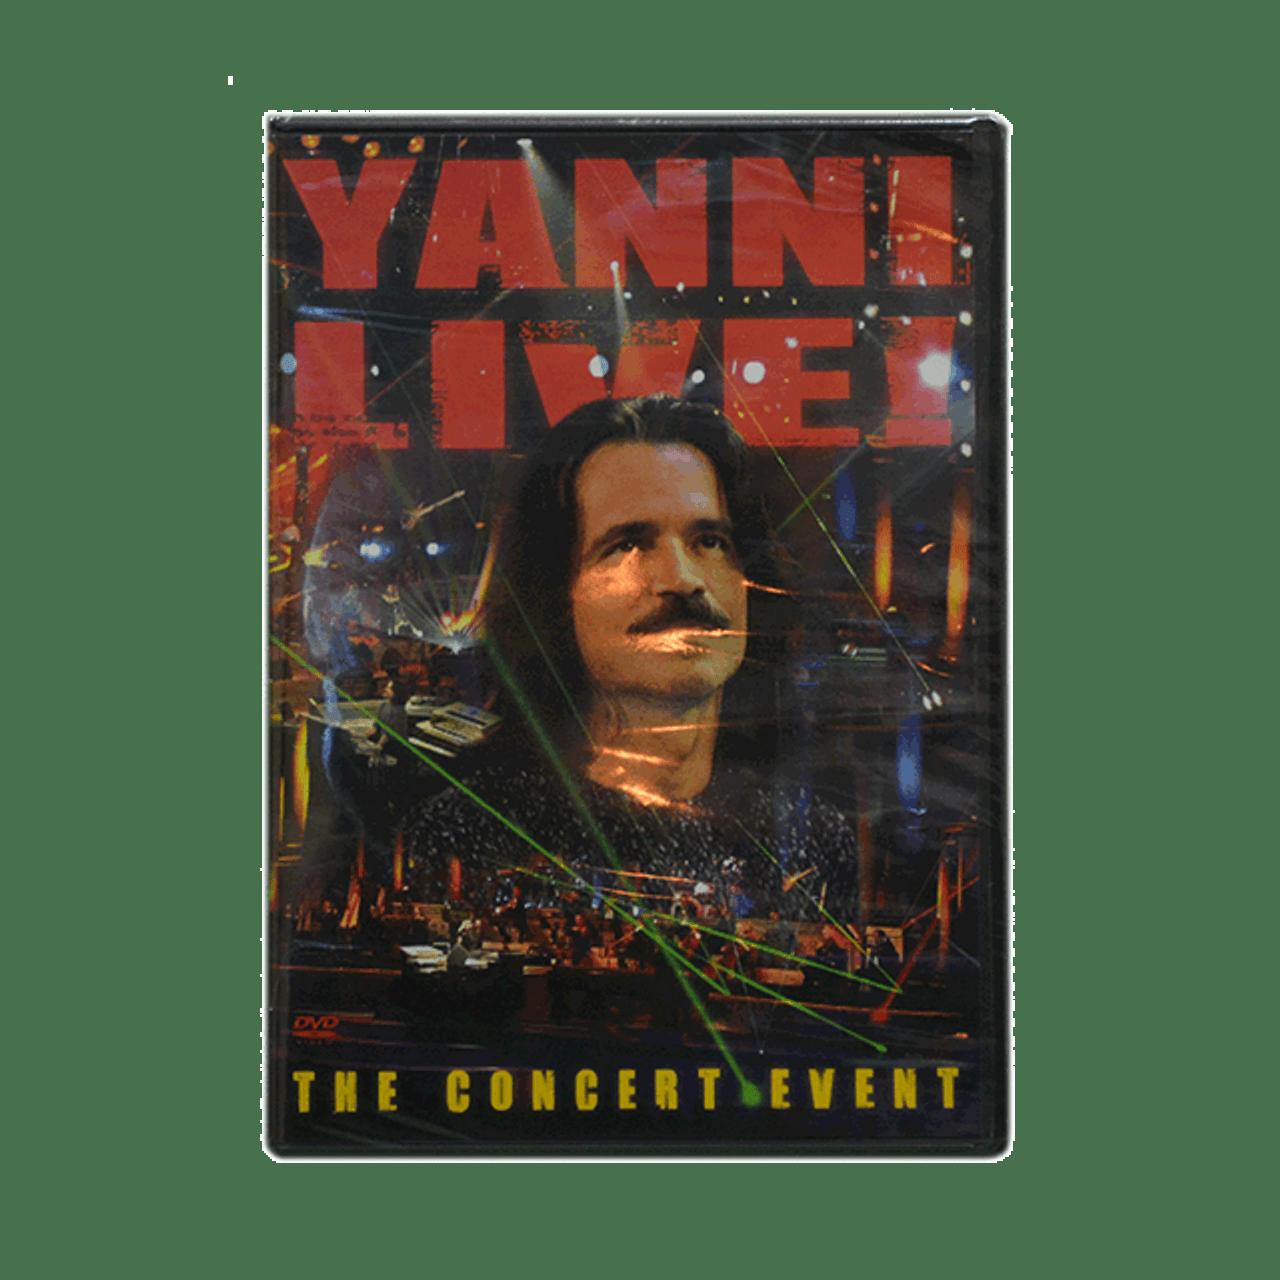 Yanni Live (The Concert Event) DVD